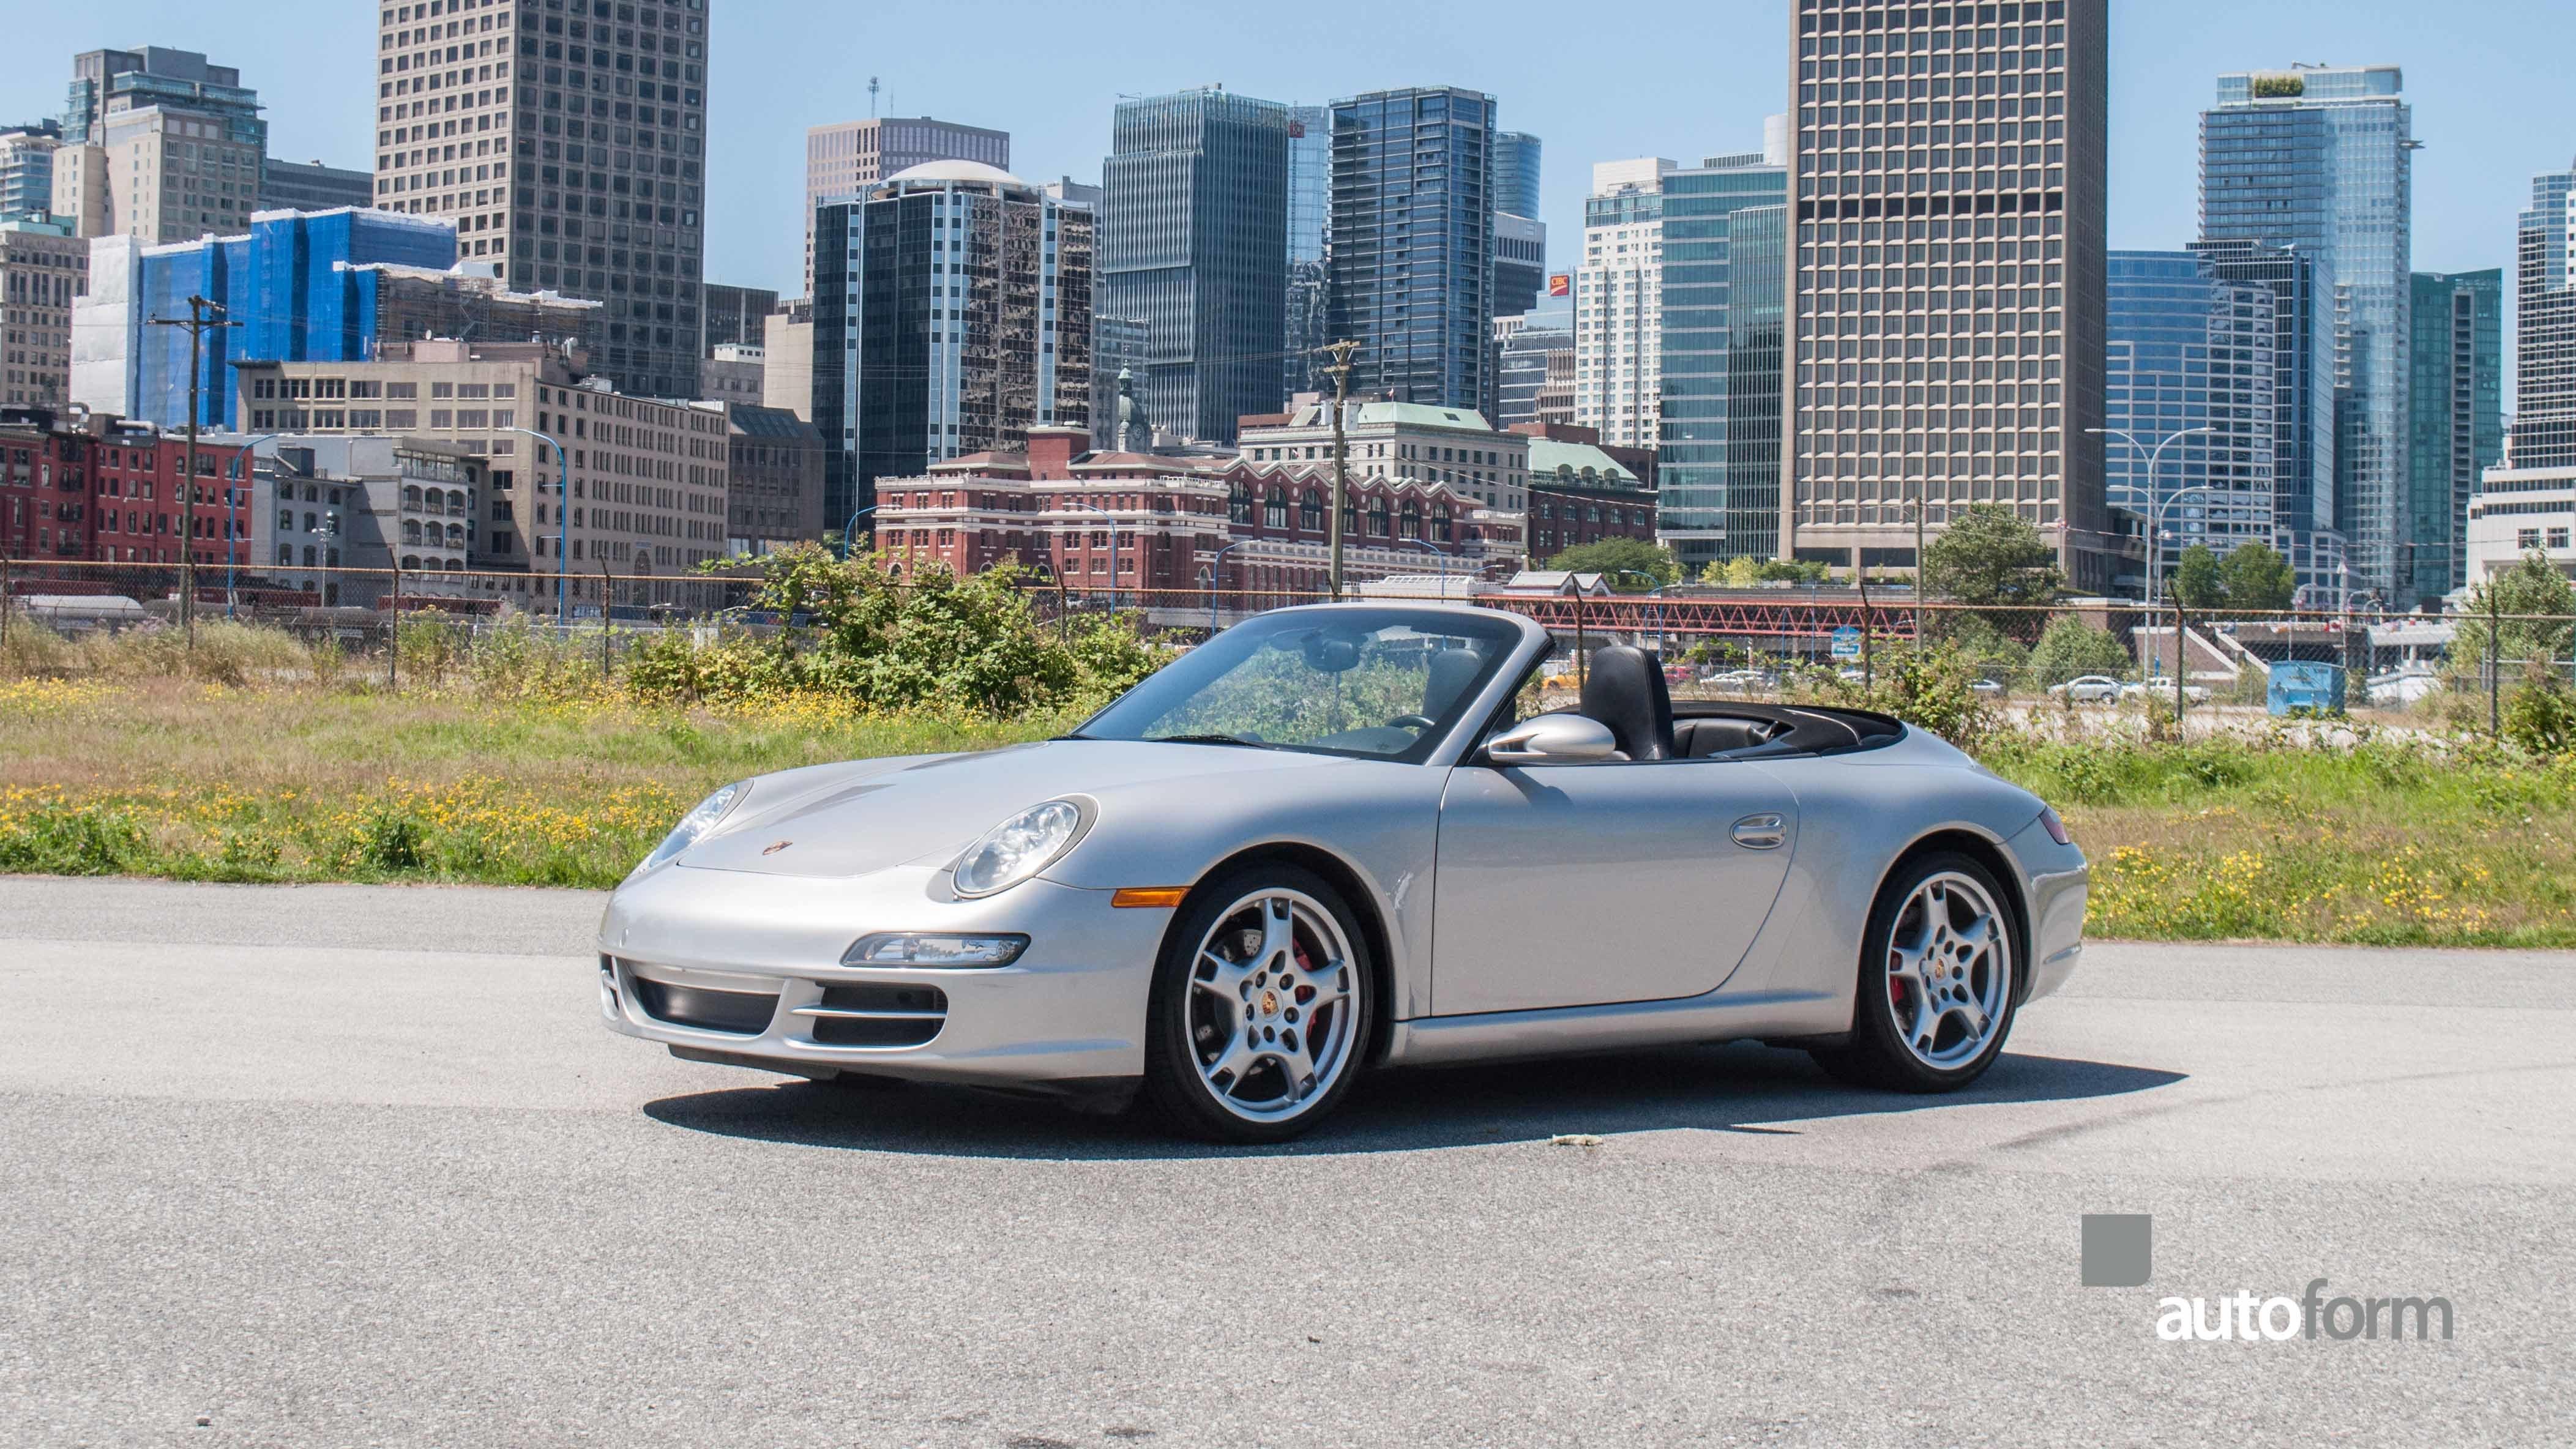 8405 82d4be6c00f52005 porsche 911 carrera s vancouver autoform1